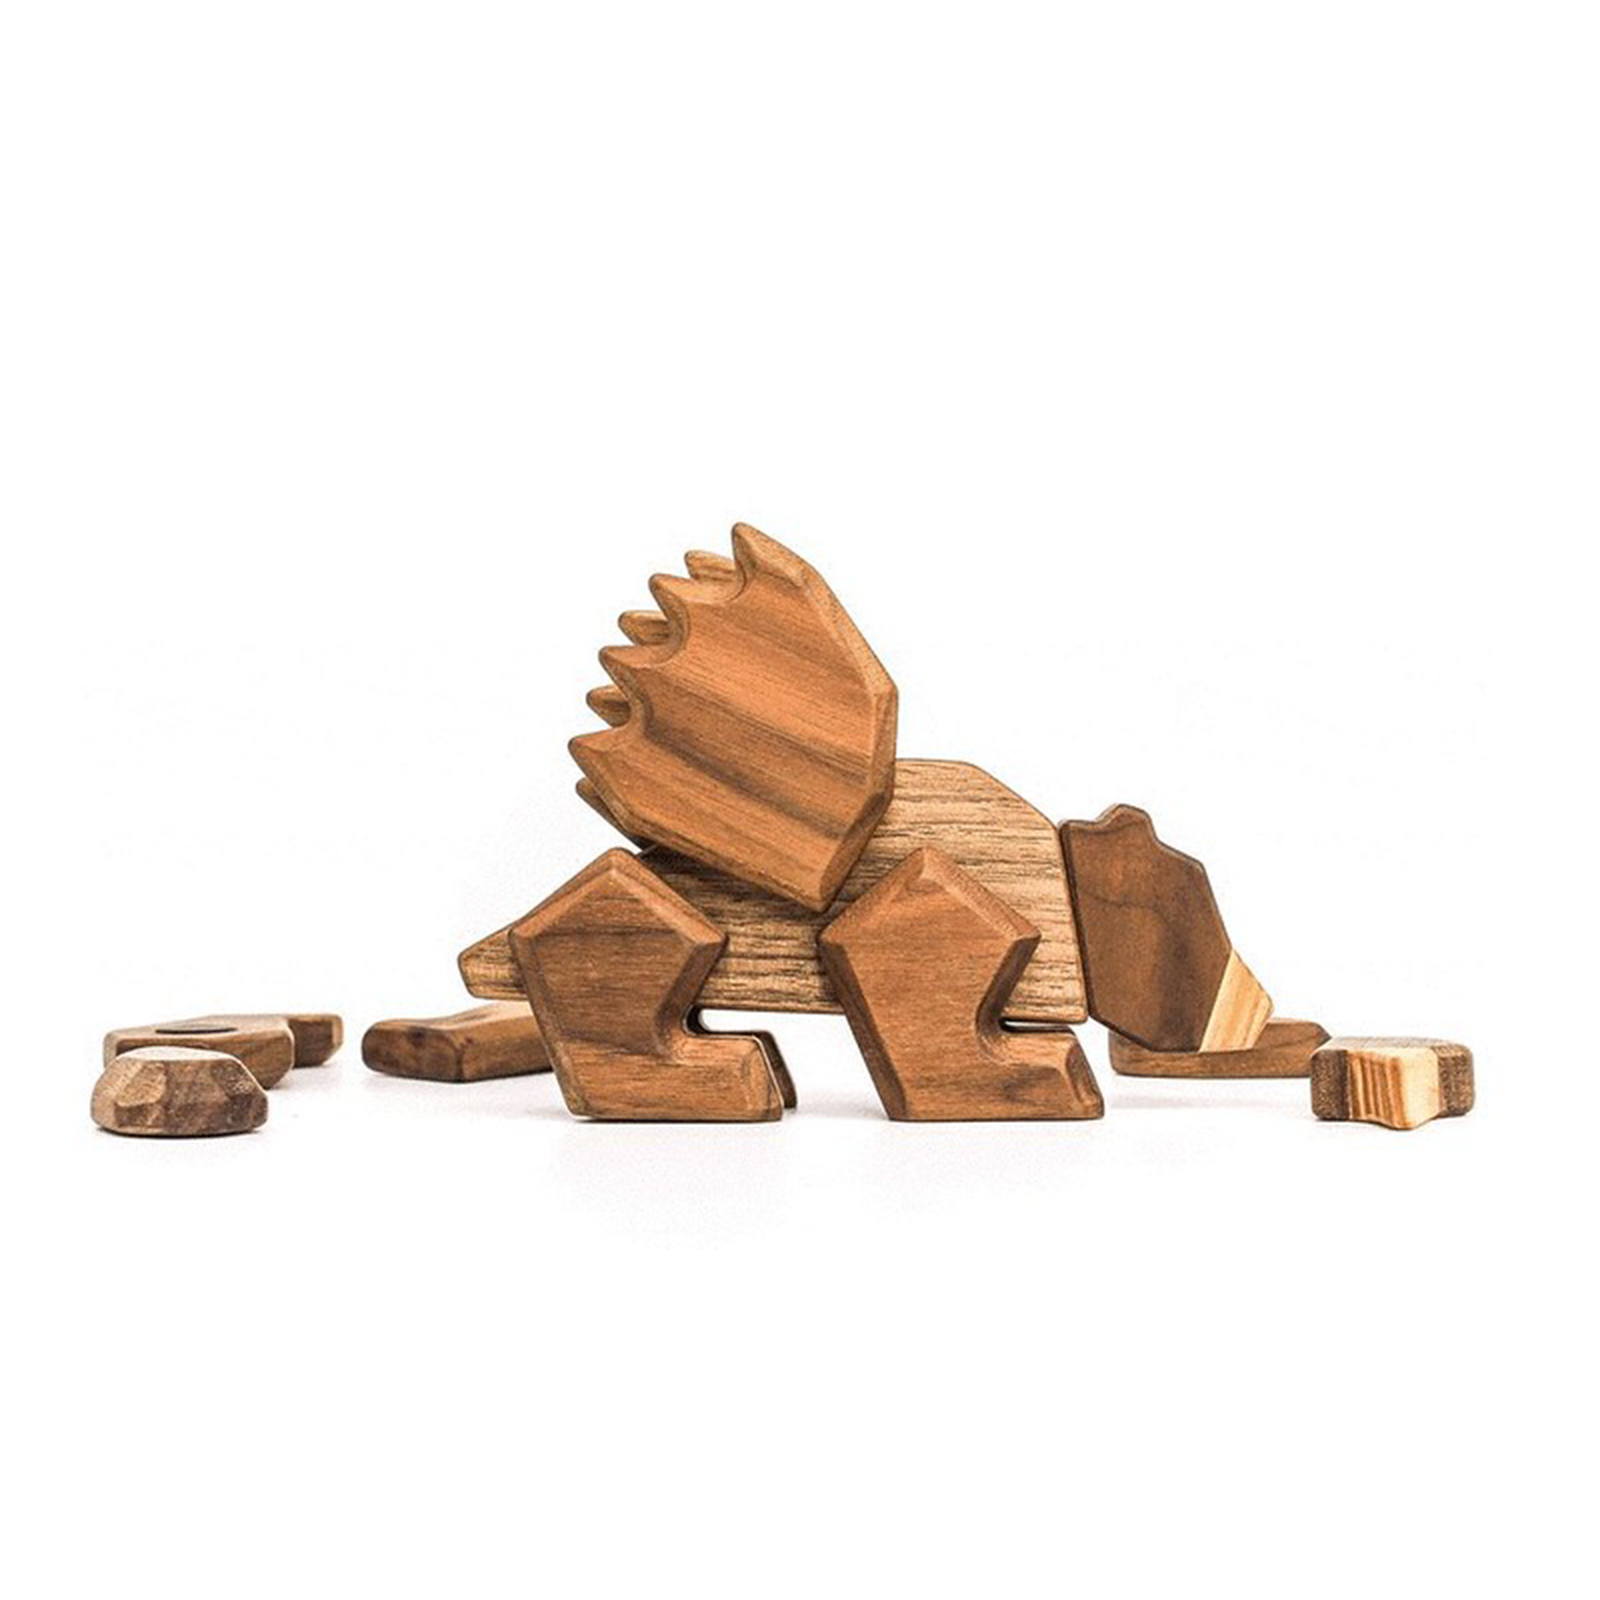 Fabeldyr - krokodille - bjoern - papegoeje - dansk design - fantasidyr